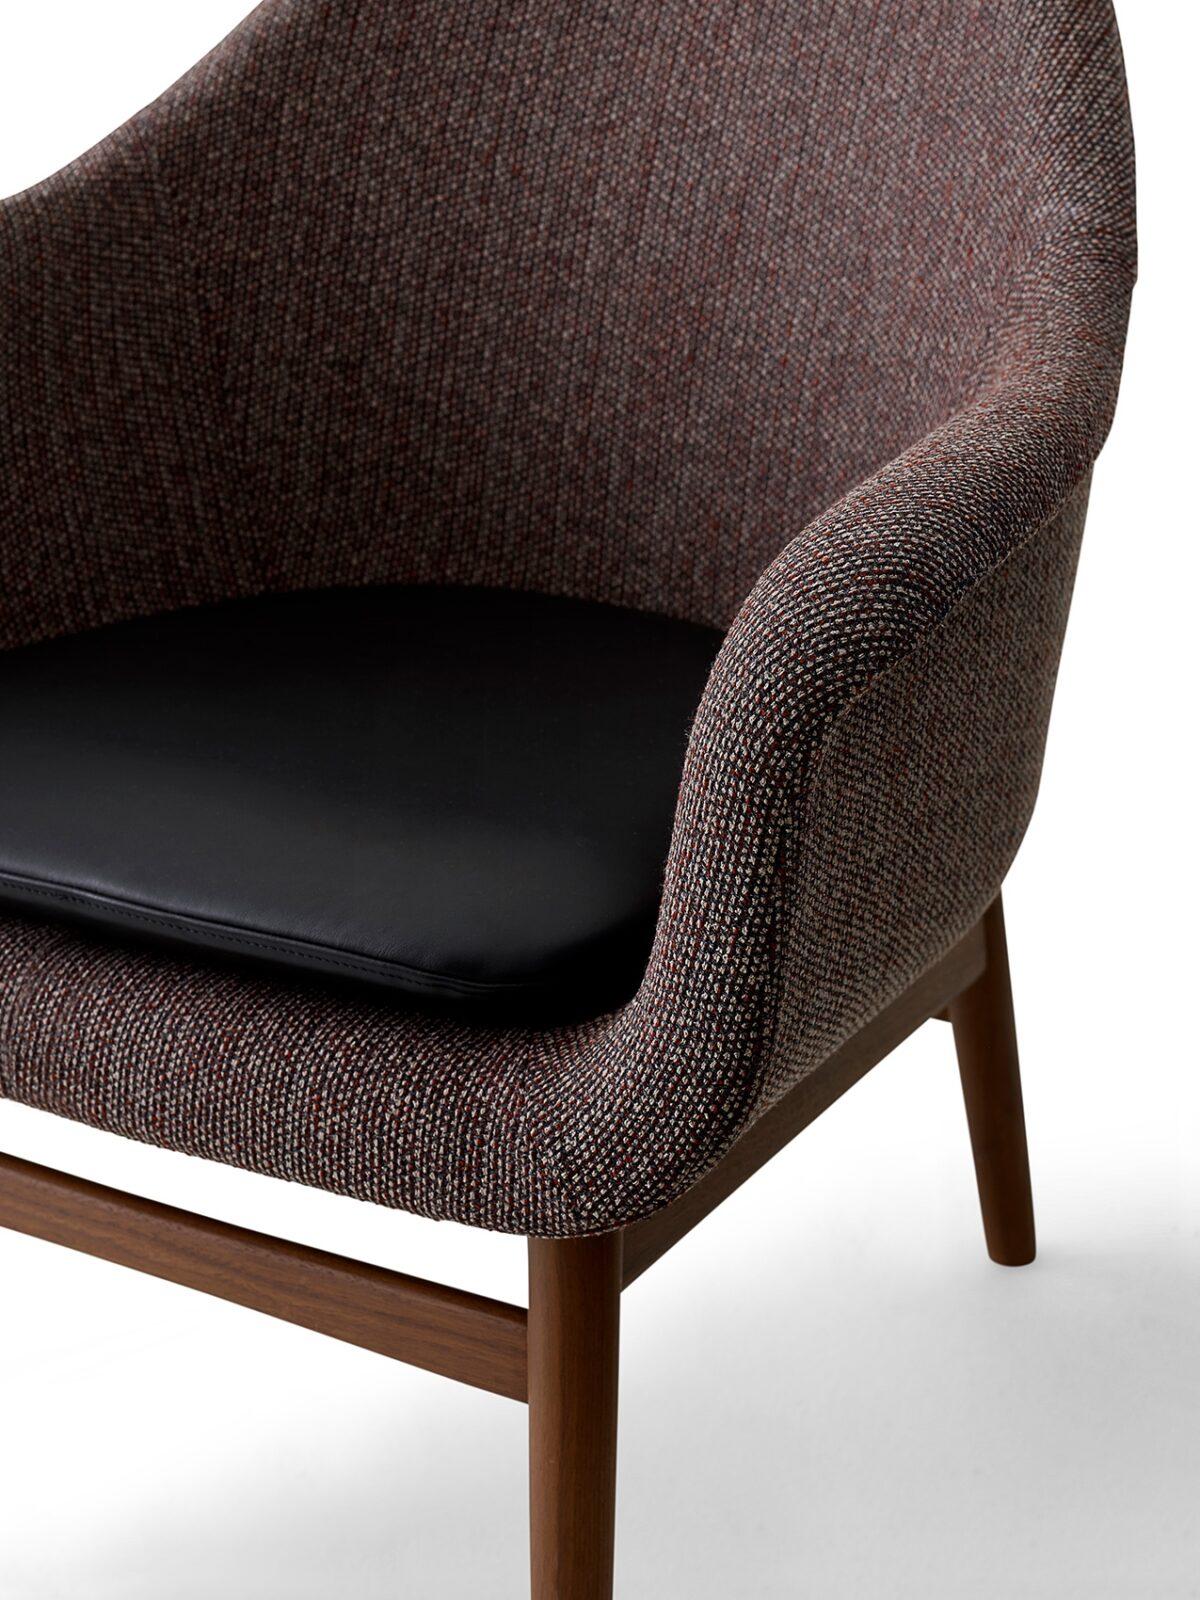 9255549 Harbour Lounge Low back Walnut Savanna 675 Shade Pitch black cushio up new